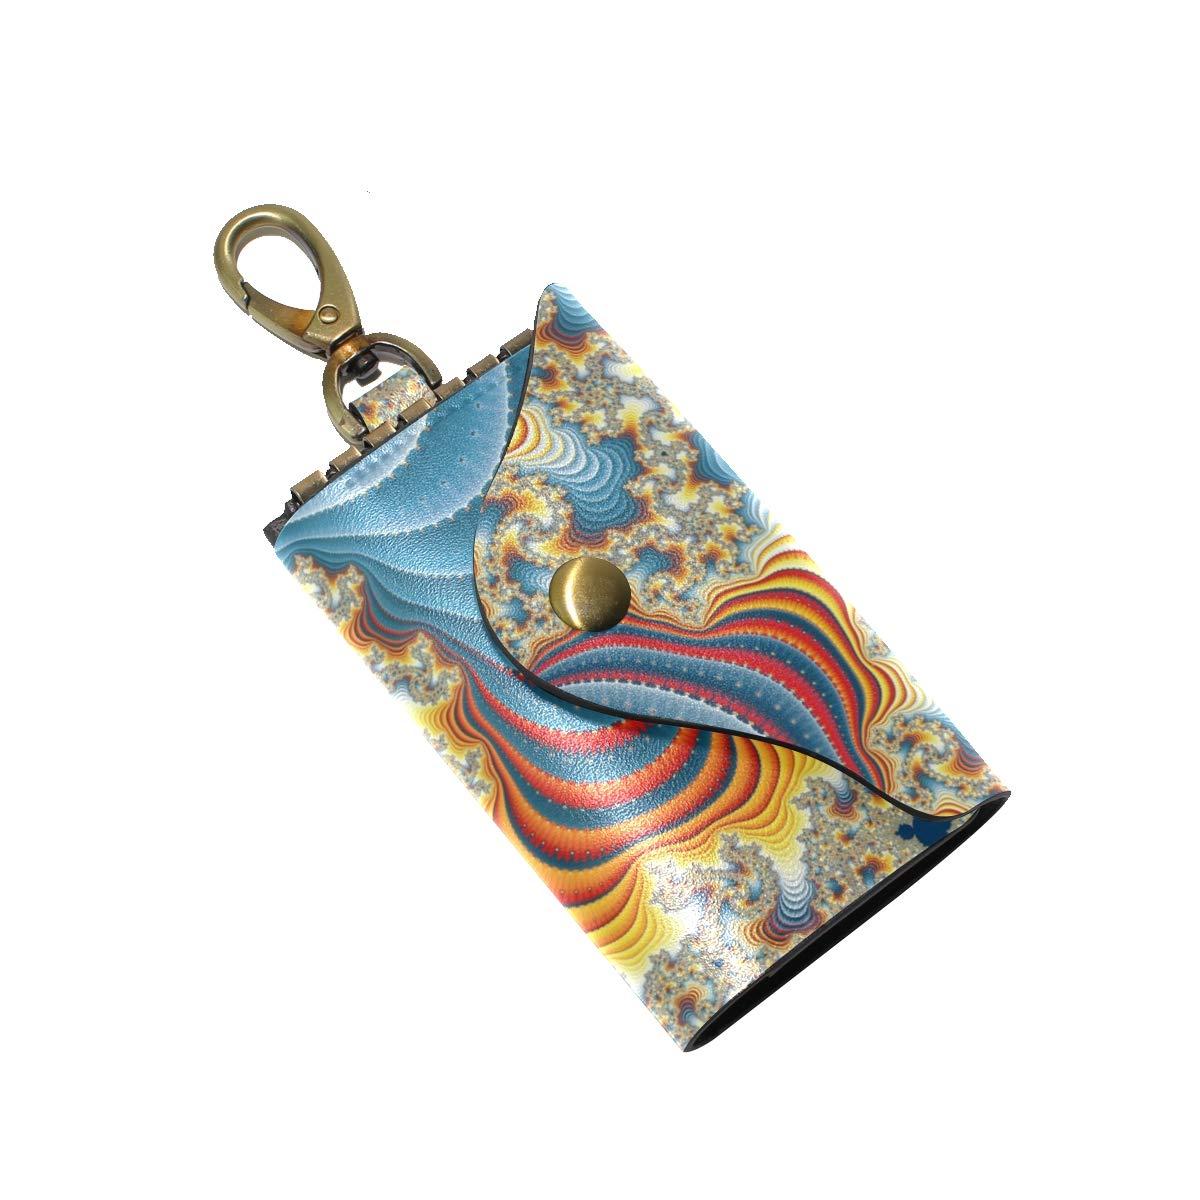 KEAKIA Fractal Print Leather Key Case Wallets Tri-fold Key Holder Keychains with 6 Hooks 2 Slot Snap Closure for Men Women